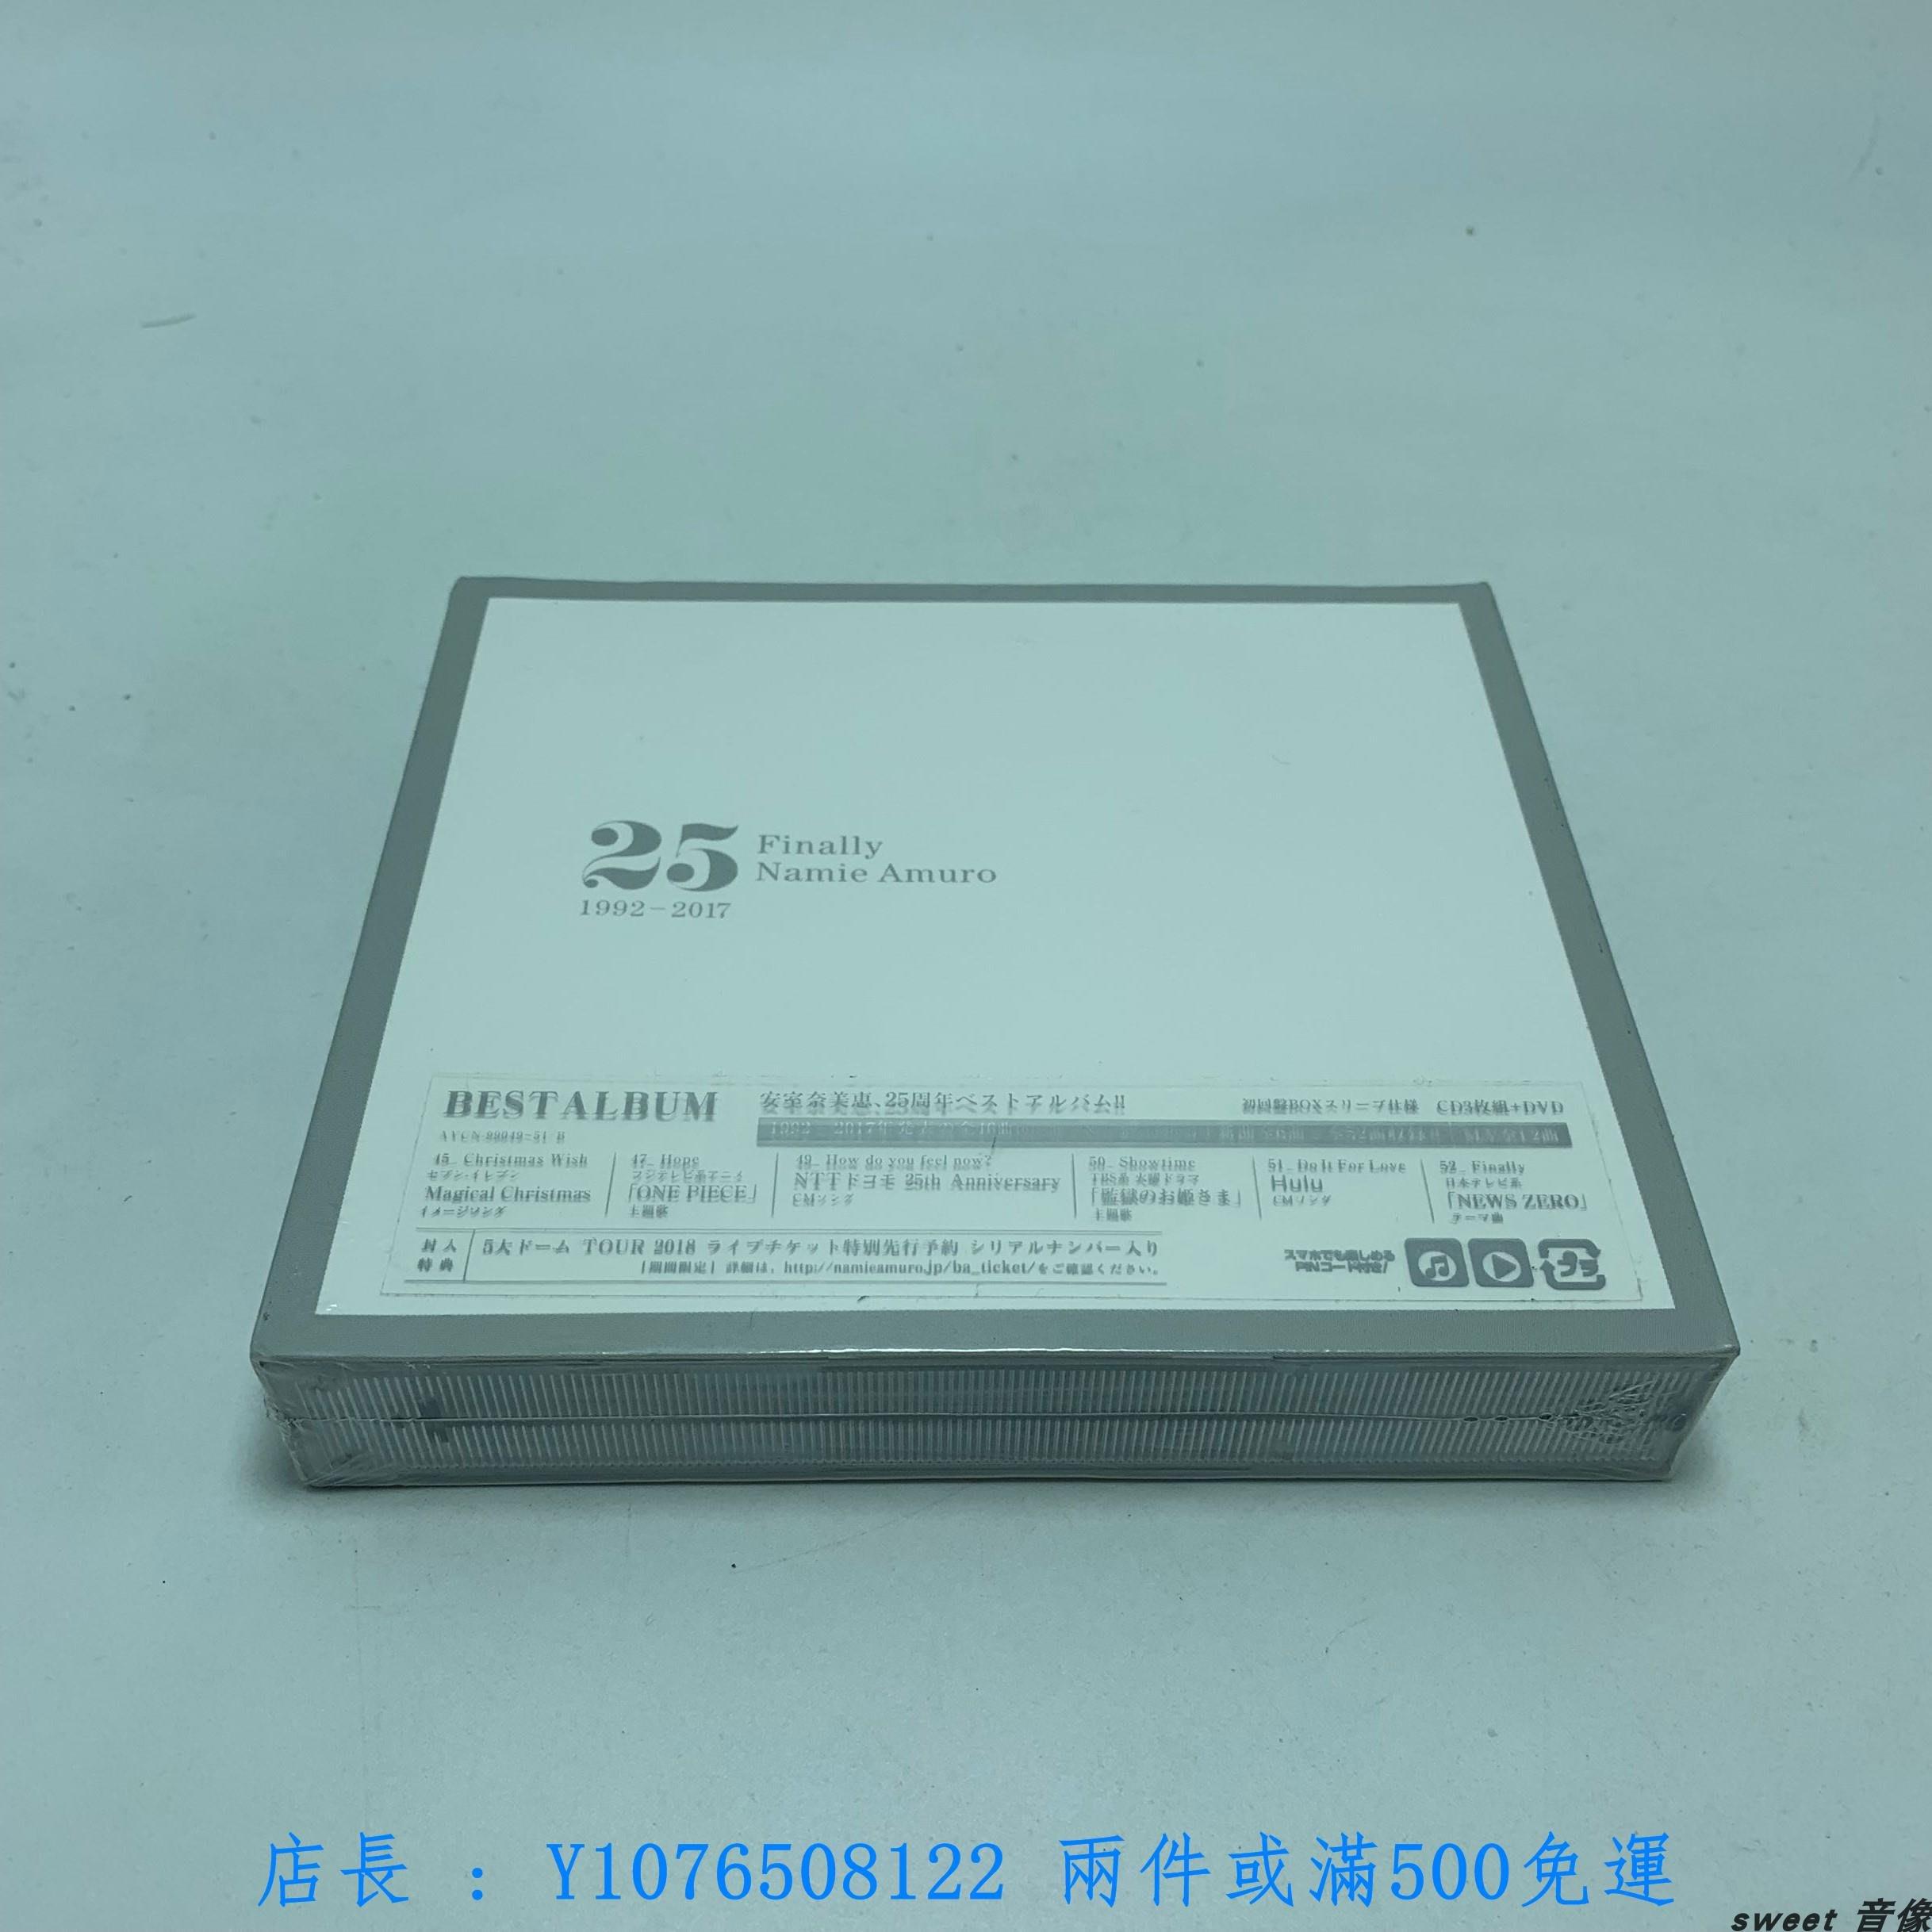 CD 安室奈美惠 NAMIE AMURO Finally 3CD+DVD雅慈店